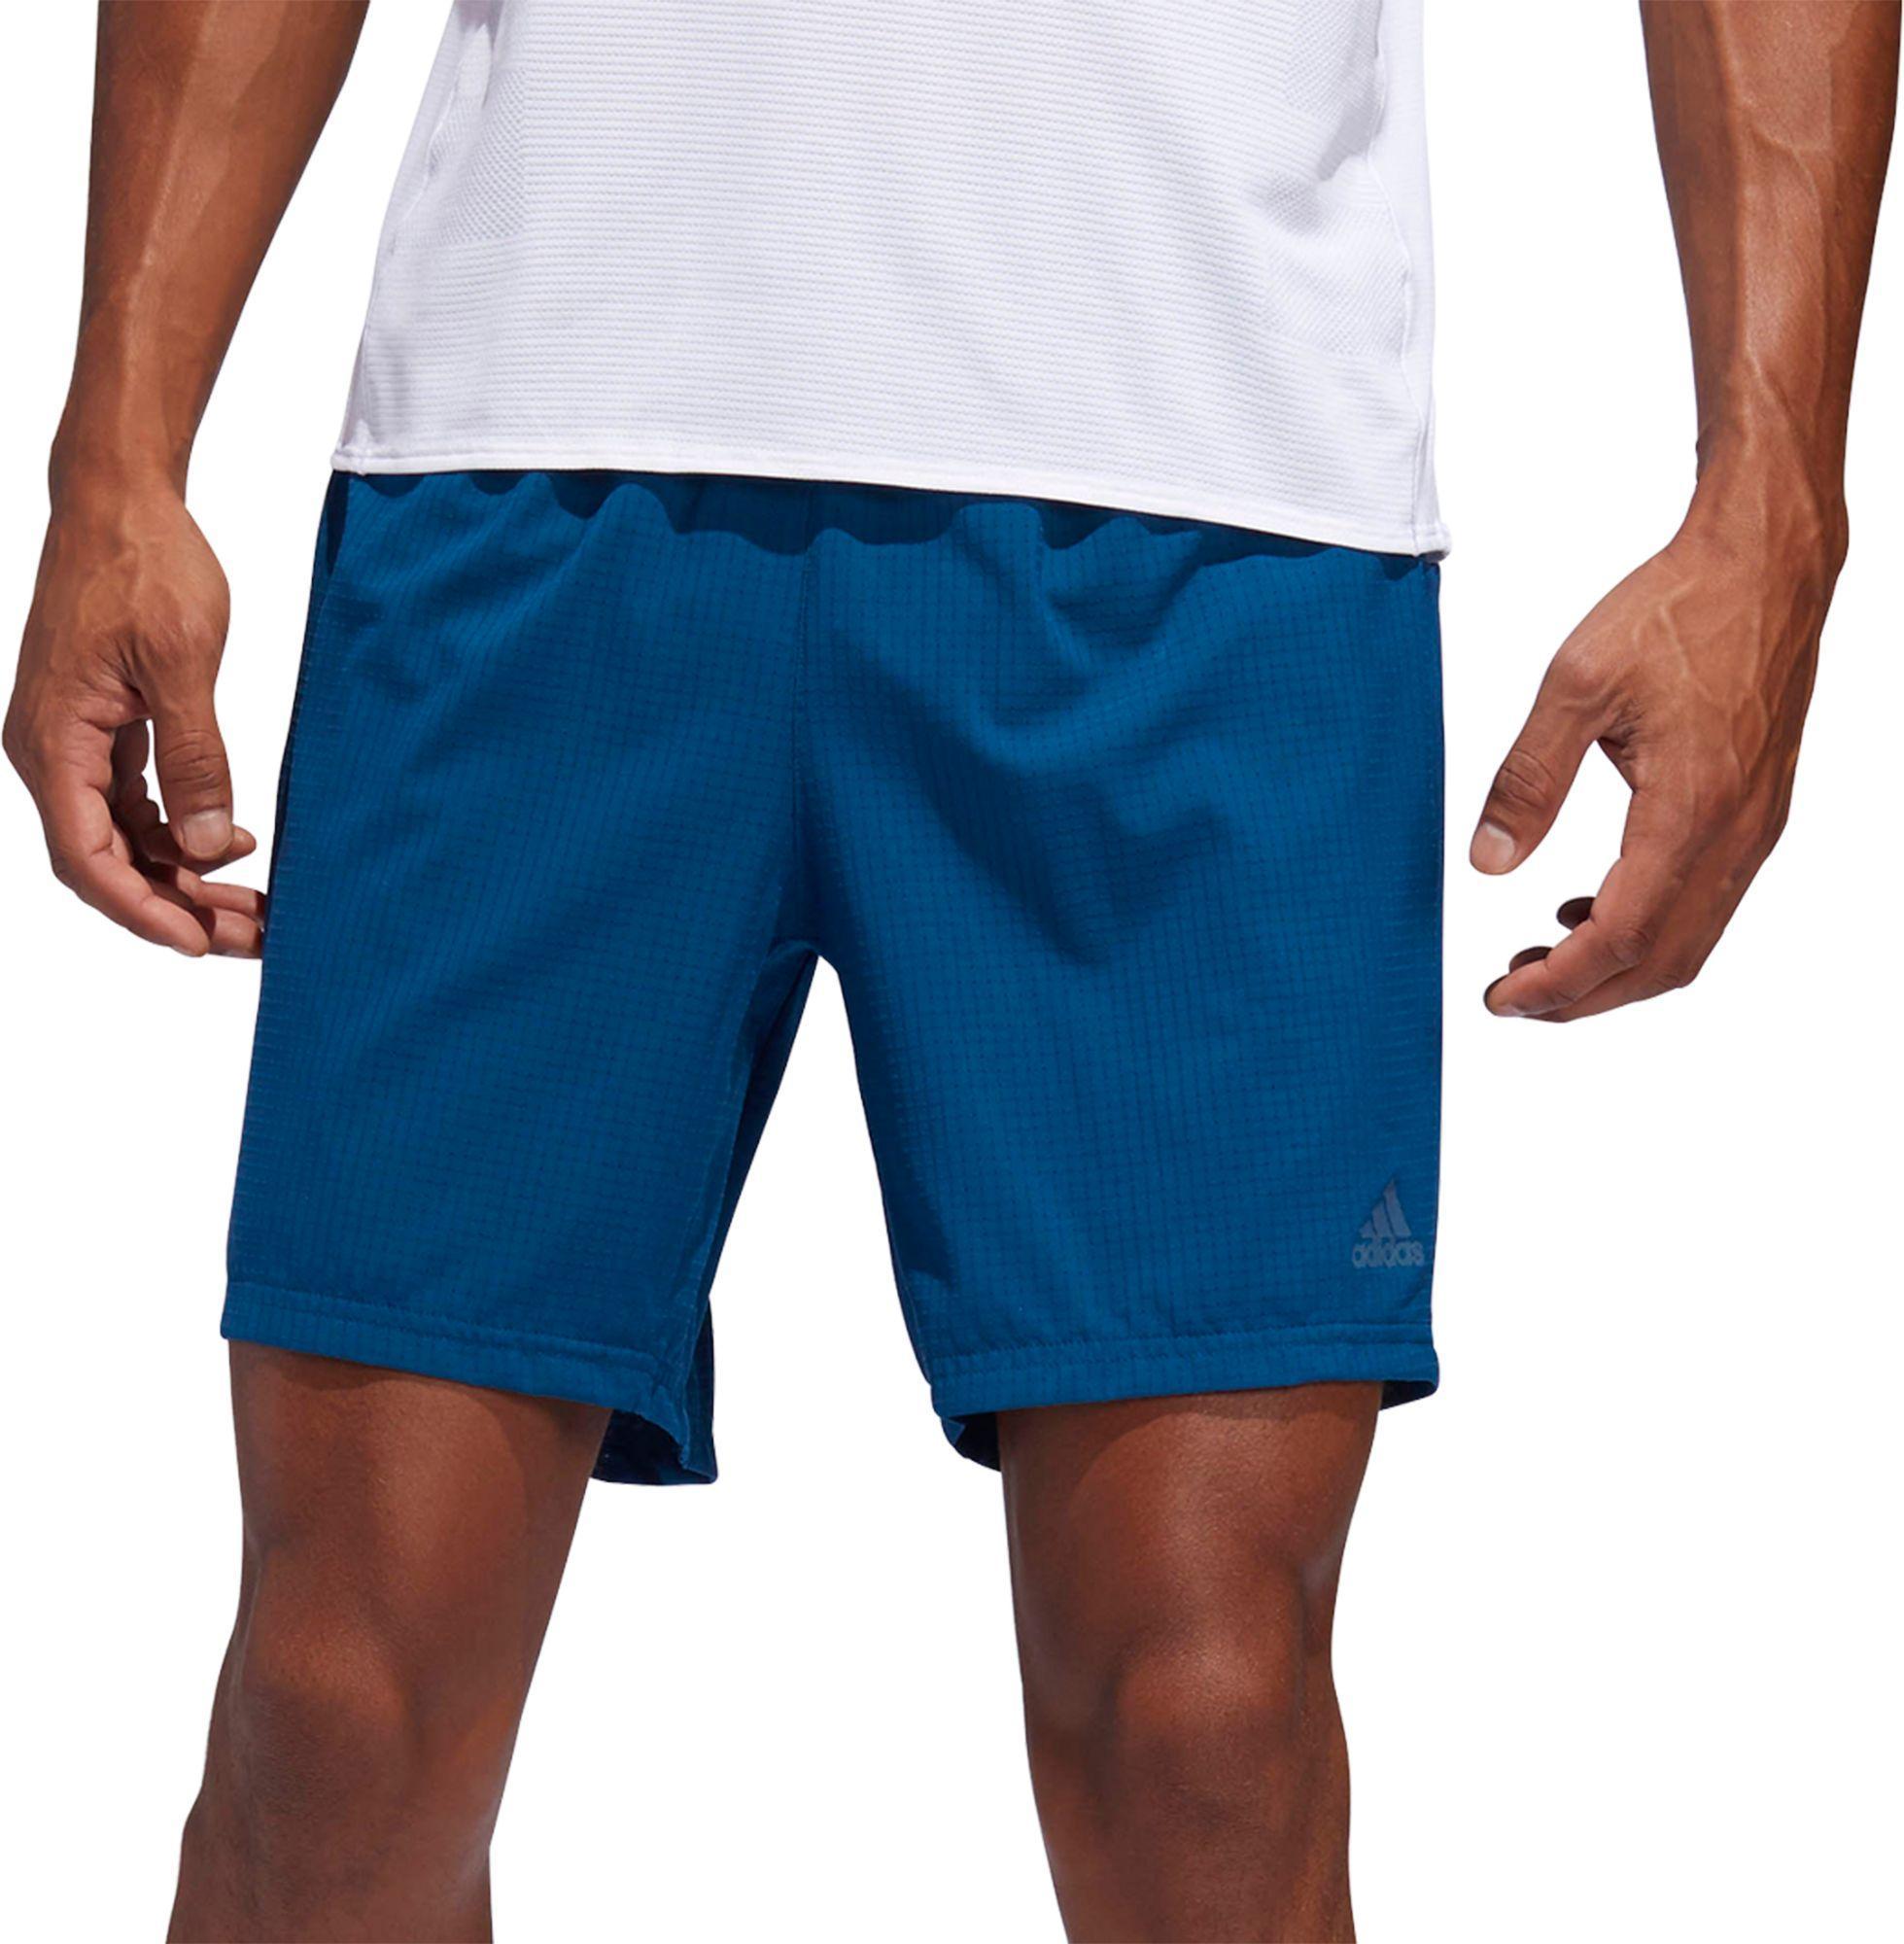 adidas supernova shorts 5 inch